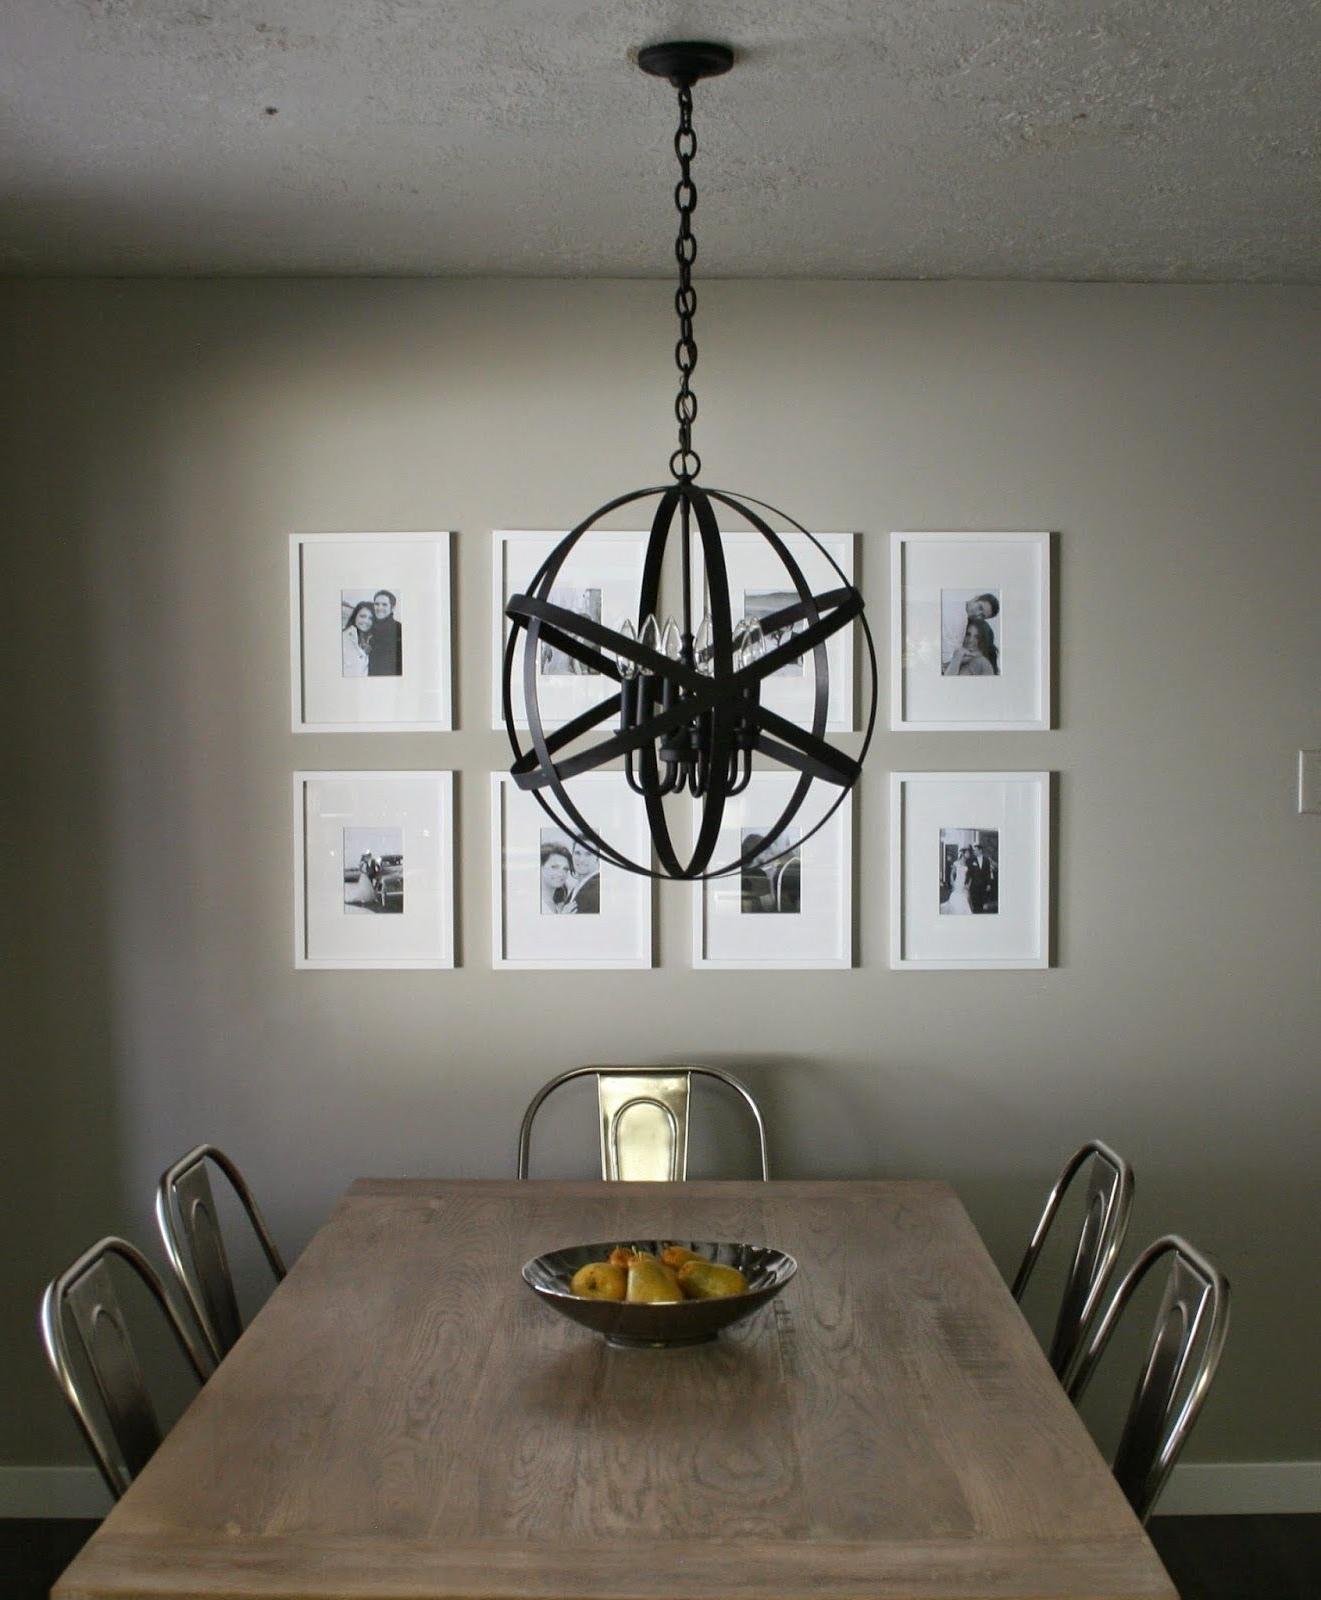 Orb Chandeliers Throughout Most Current Andrea West Design Blog: Diy Designer Black Orb Chandelier (View 16 of 20)